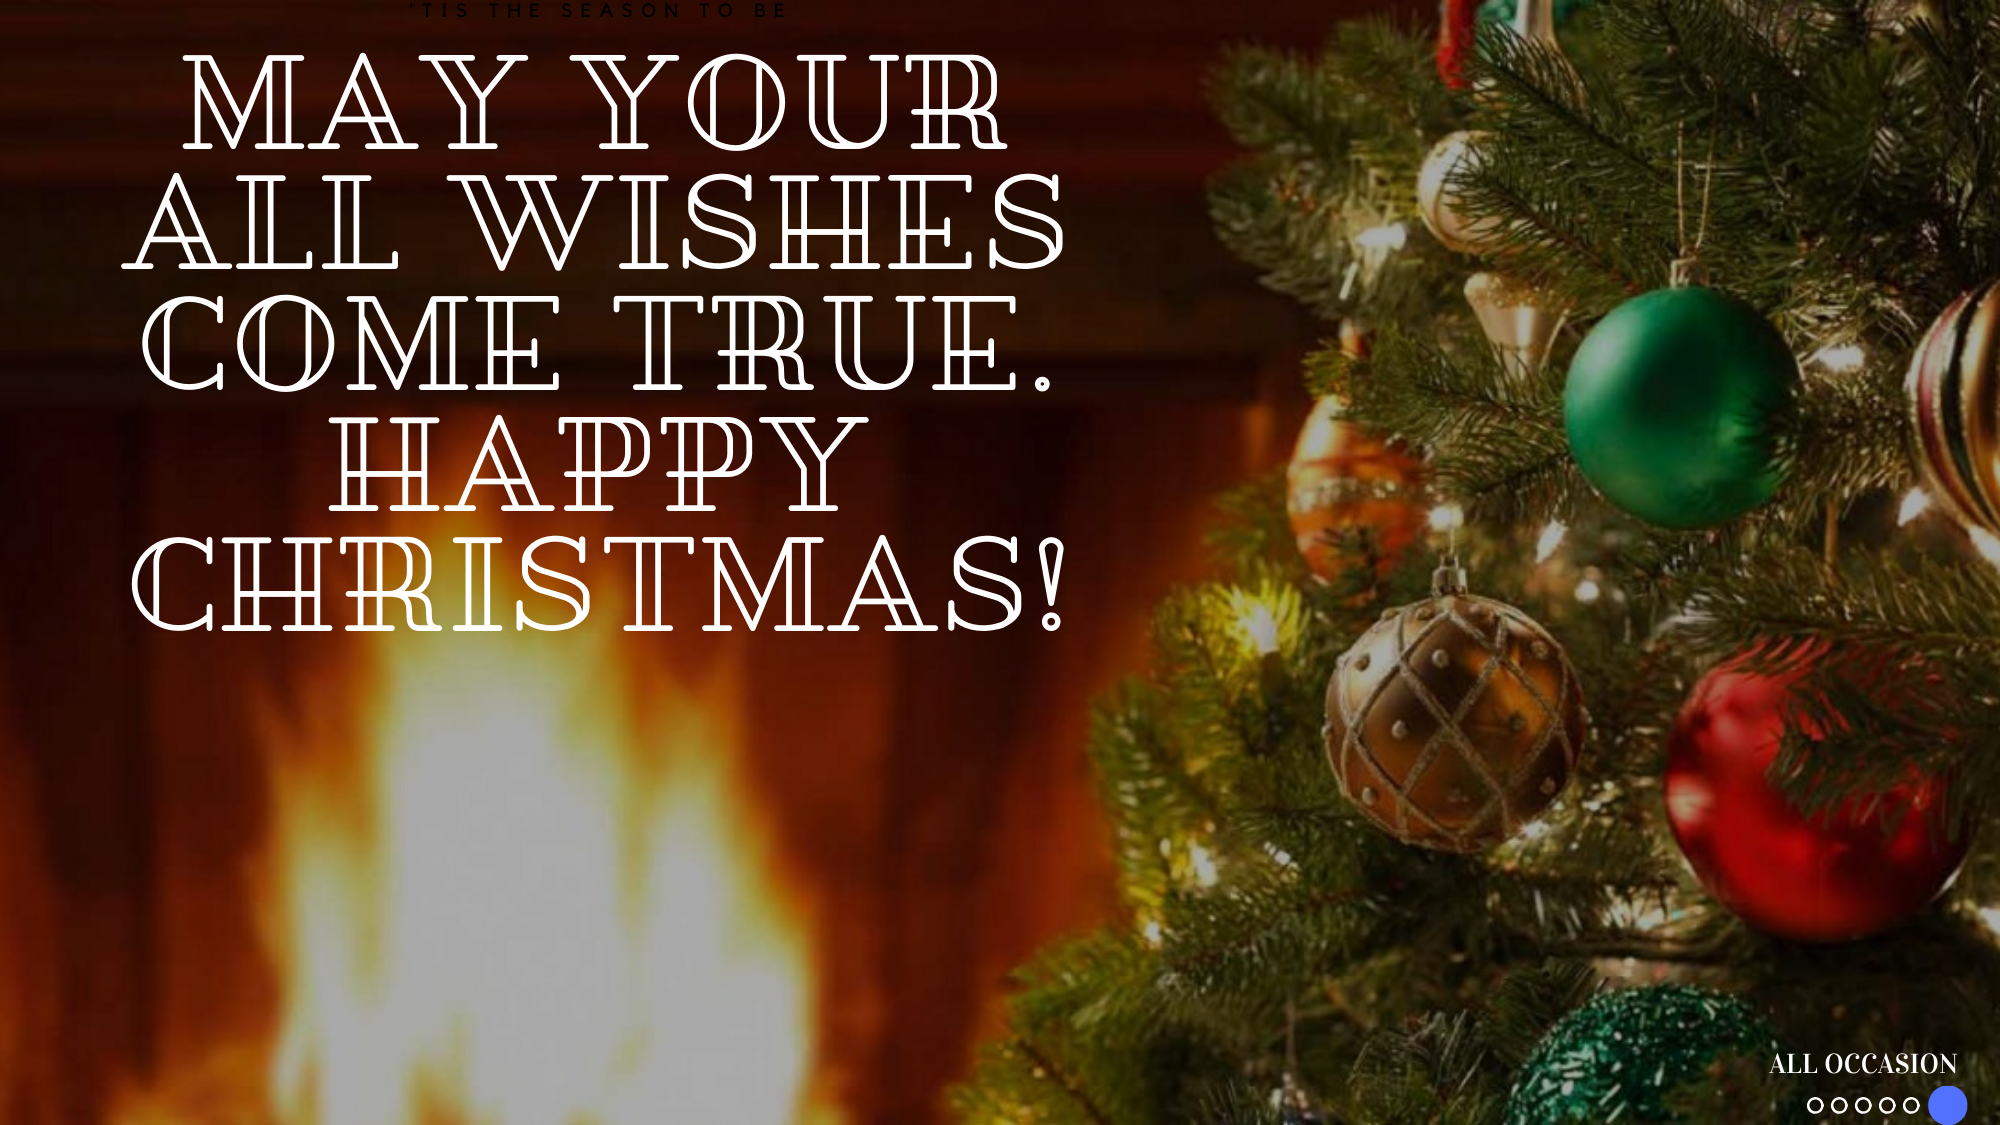 Merry Christmas Wishes Merry Christmas Wishes Merry Christmas To All Christmas Wishes